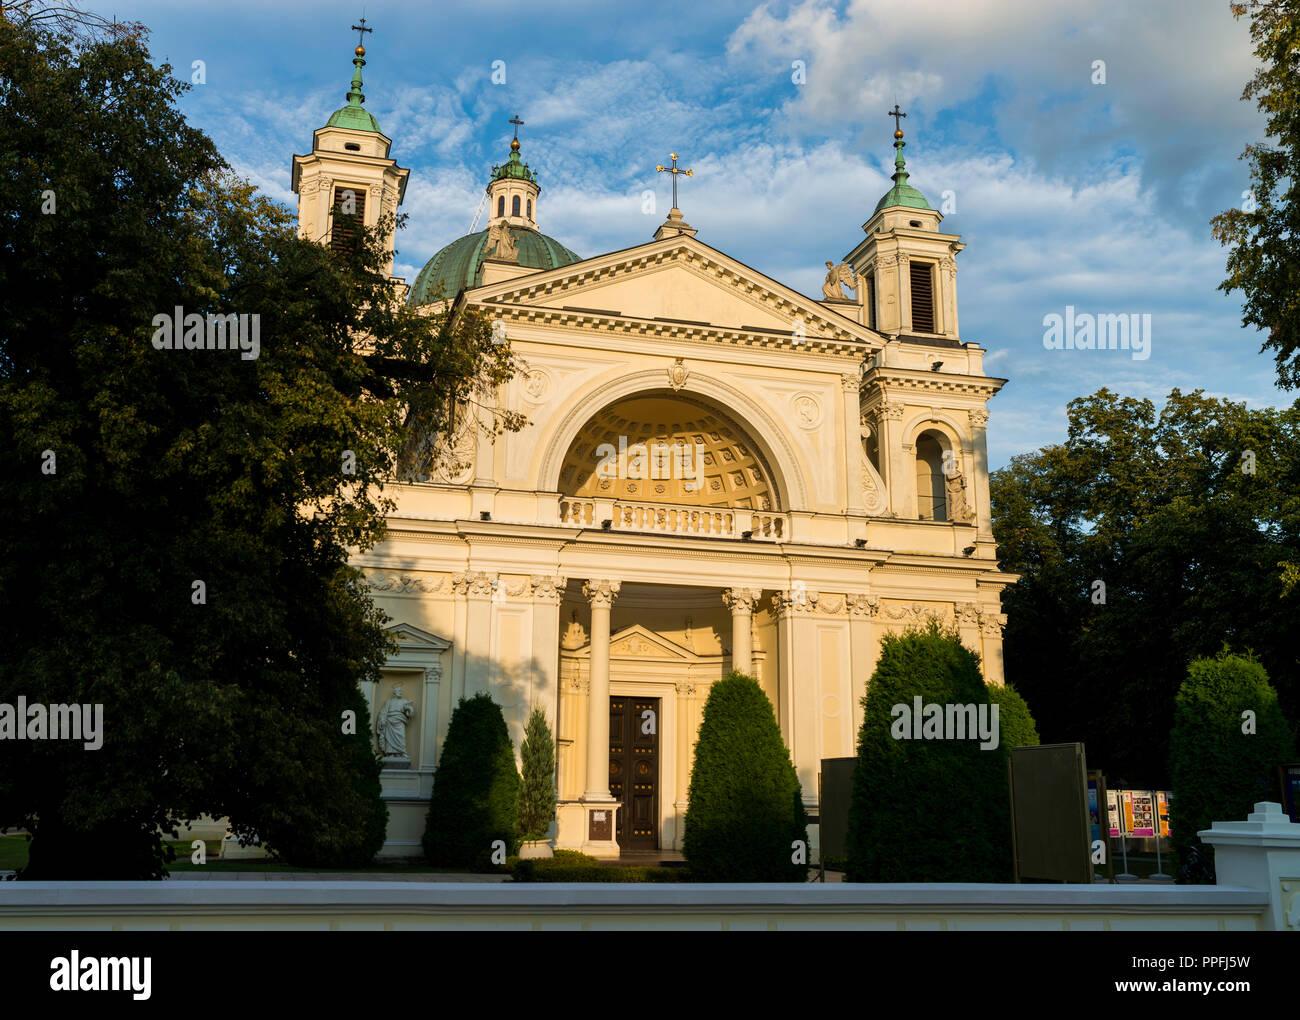 Church of St. Anna Wilanow - Stock Image